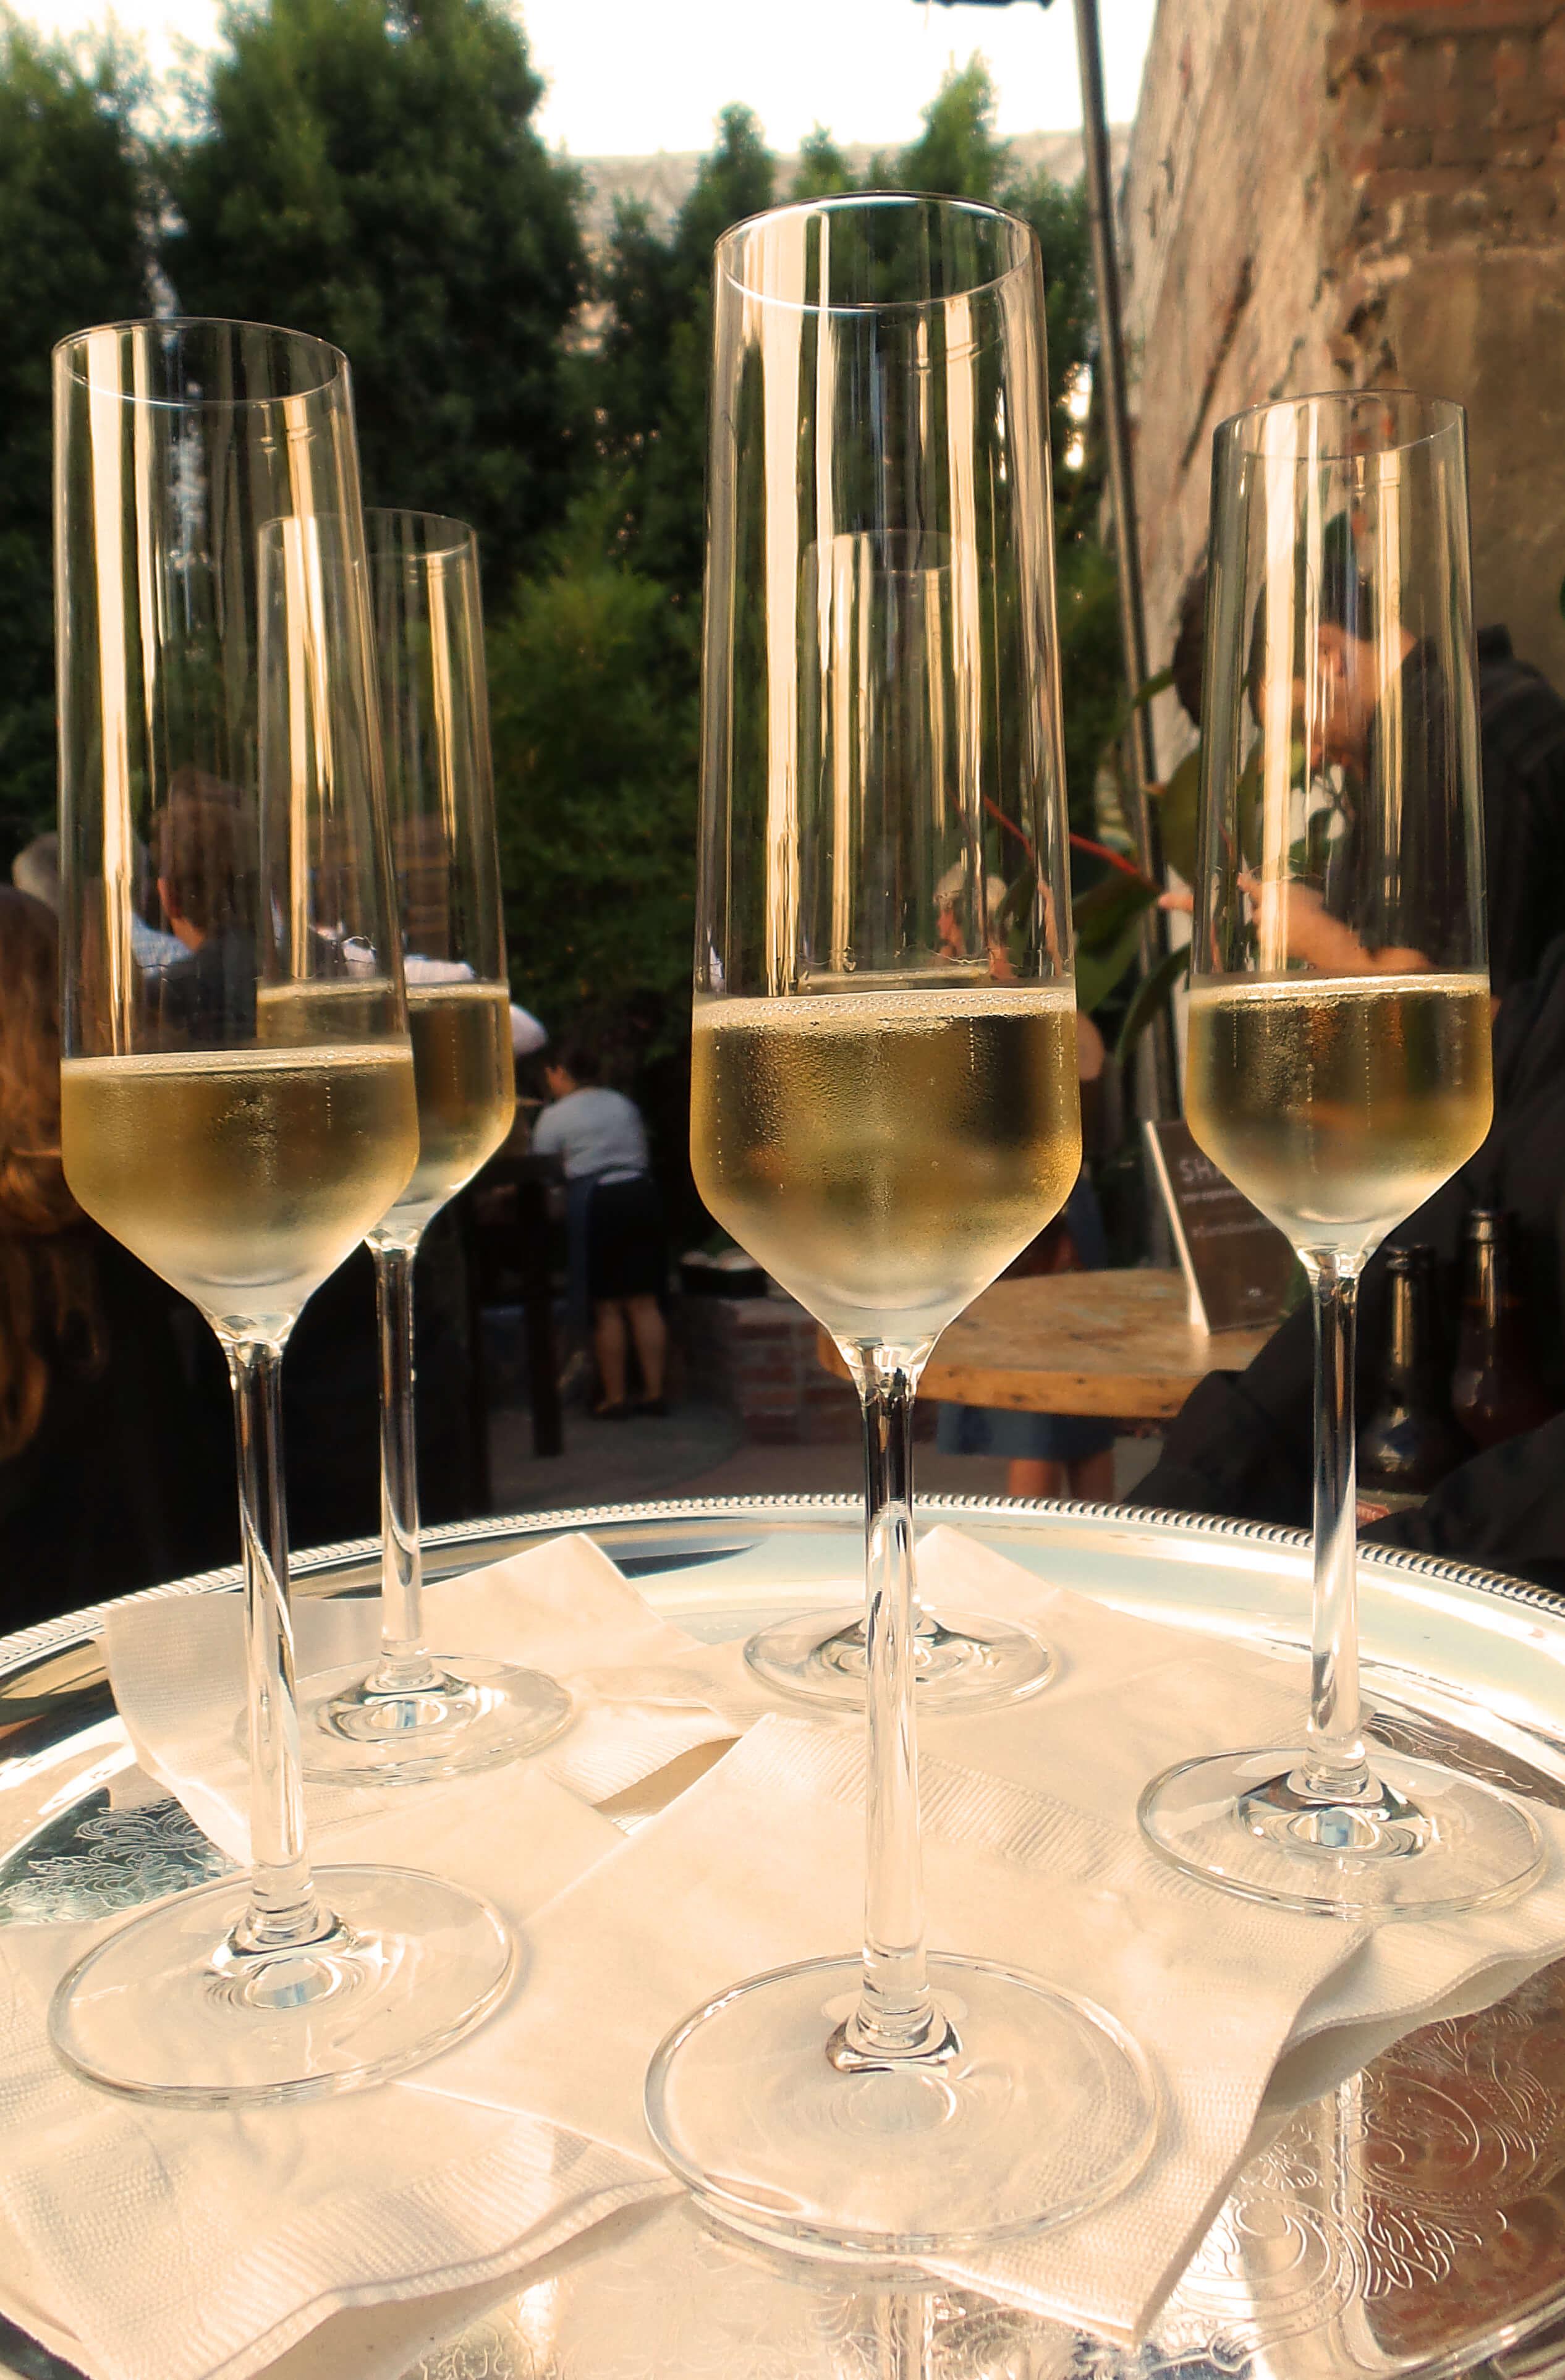 Nicolas Feuillatte Blue Label Reserve Brut Champagne